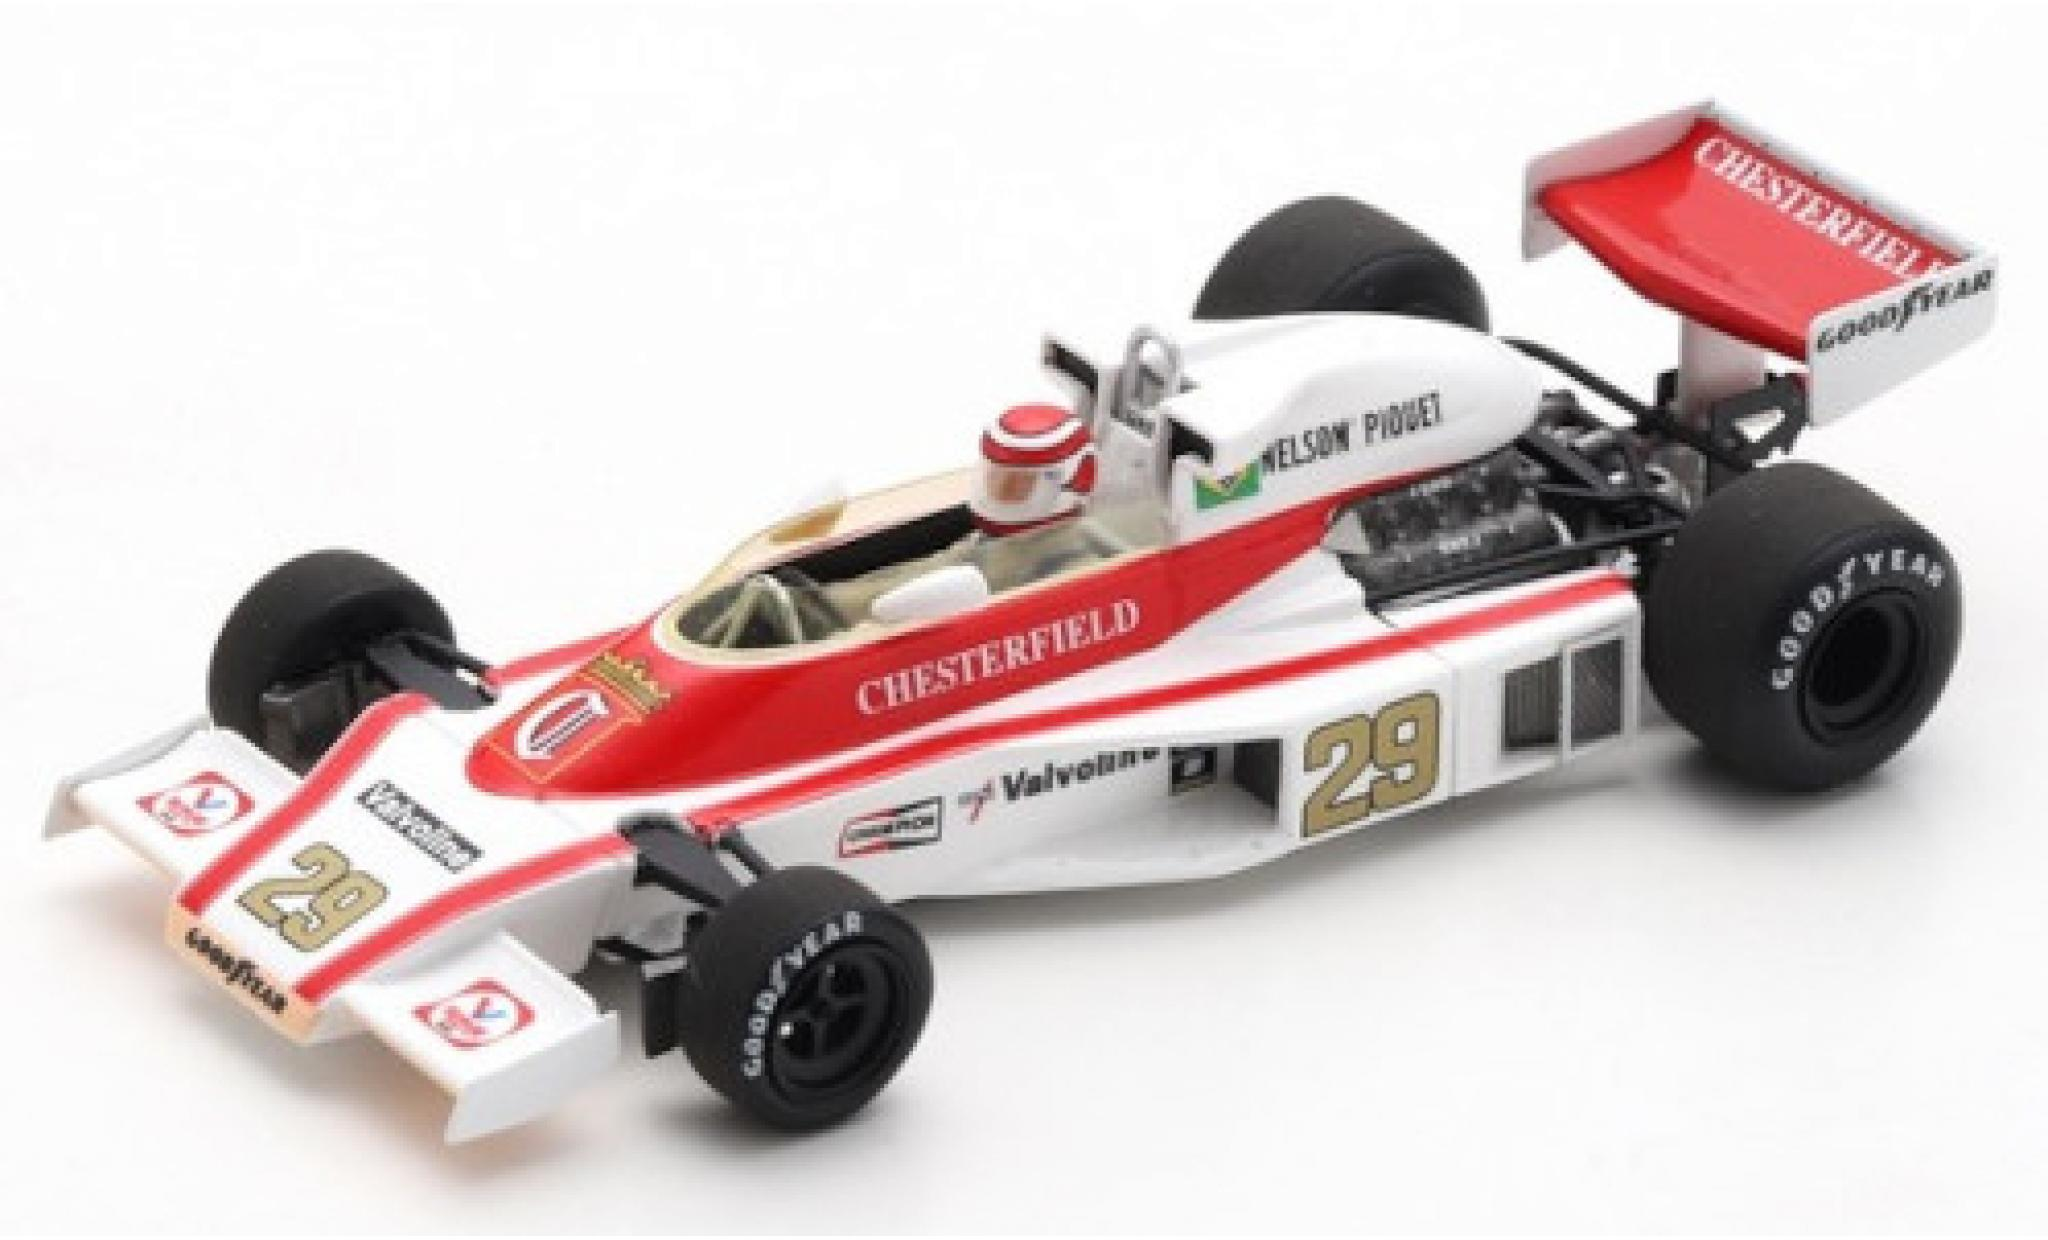 McLaren M23 1/43 Spark Ford No.29 Liggett Group / B&S Fabrications Chesterfield Formel 1 GP Österreich 1978 N.Piquet